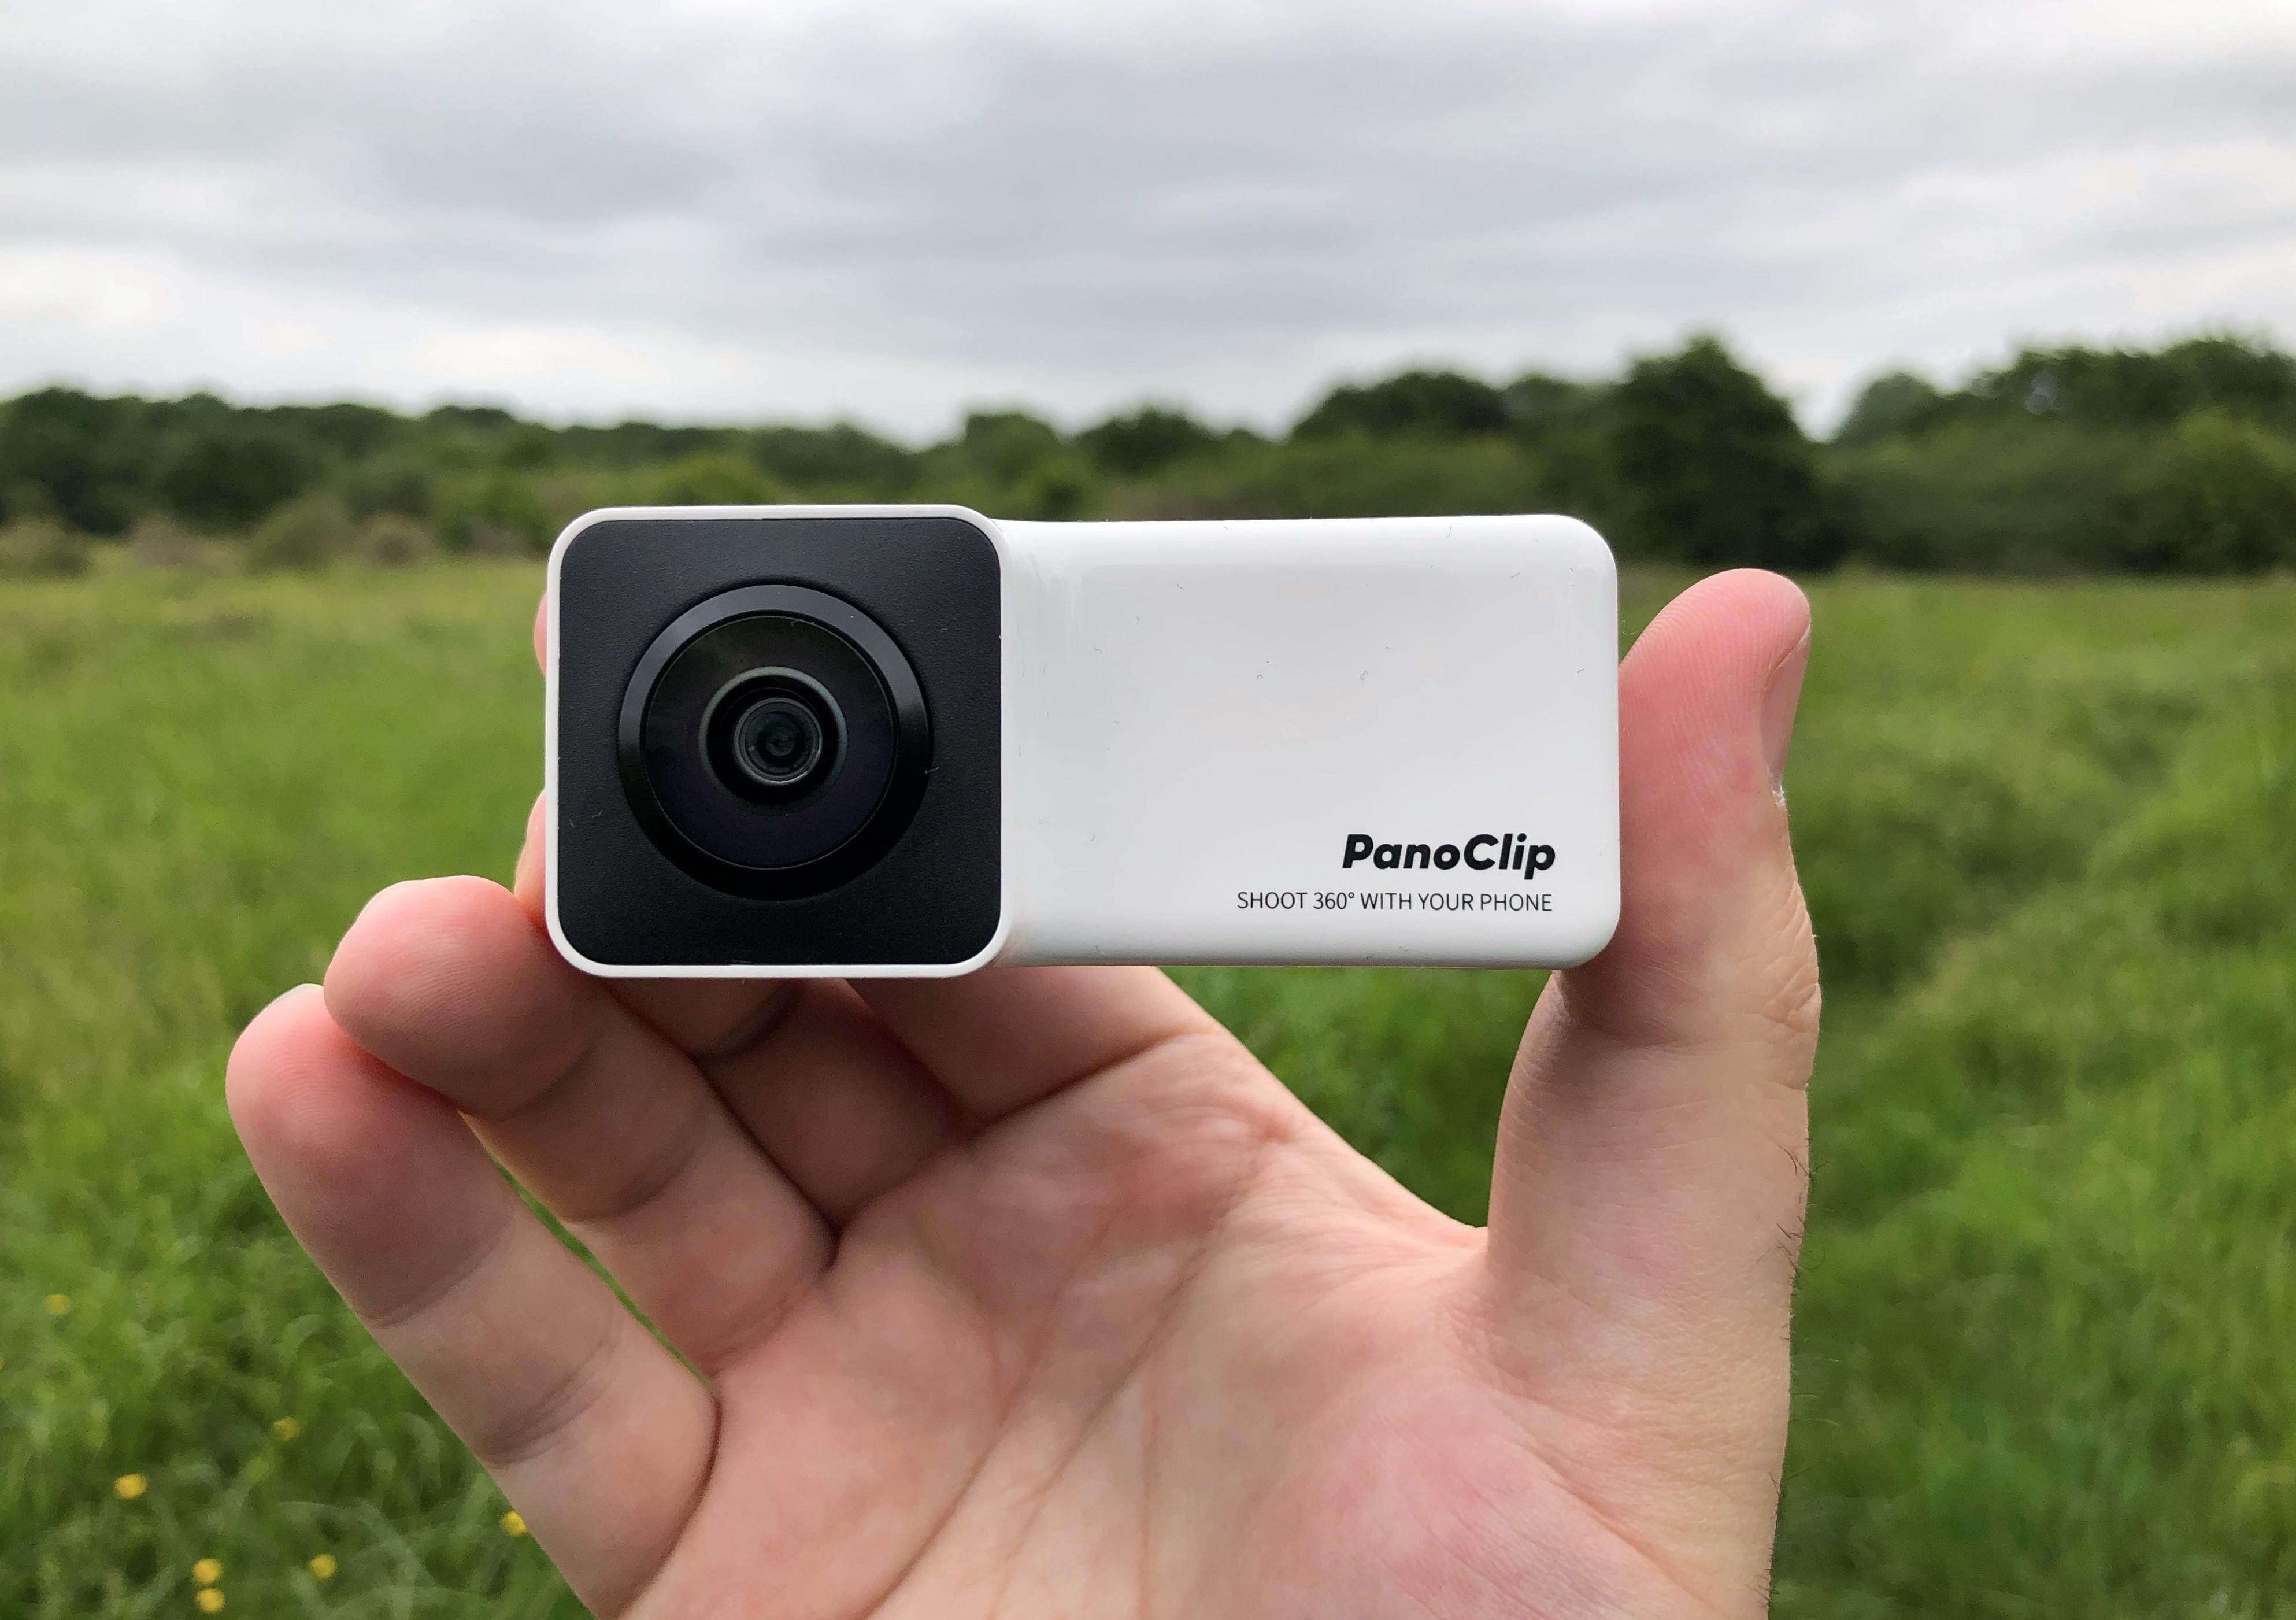 PanoClip